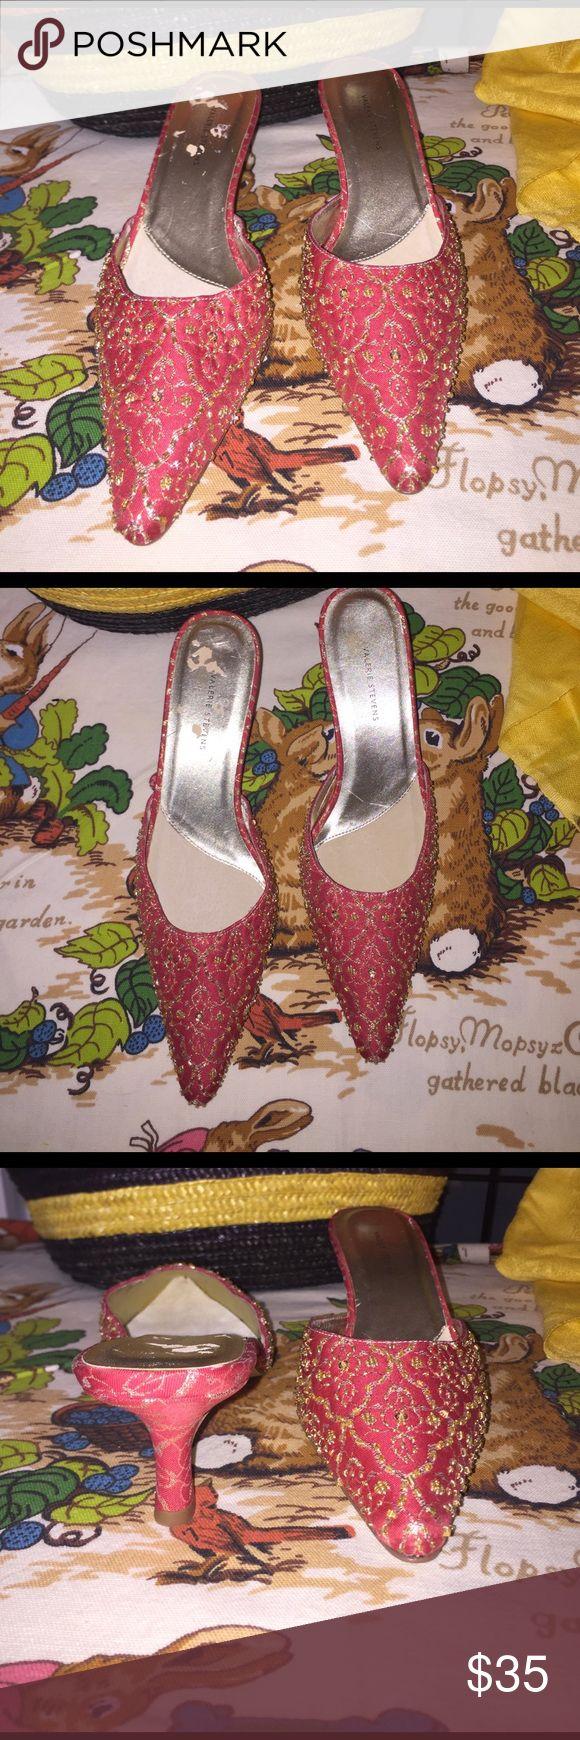 "NWT Valerie Stevens Coral & Gold sequin Slip On--S NWT Valerie Stevens Tile Coral and Gold Print with Gold Sequin Slip On.  Features a 2"" Heel sz 6 1/2m Valerie Stevens Shoes Mules & Clogs"